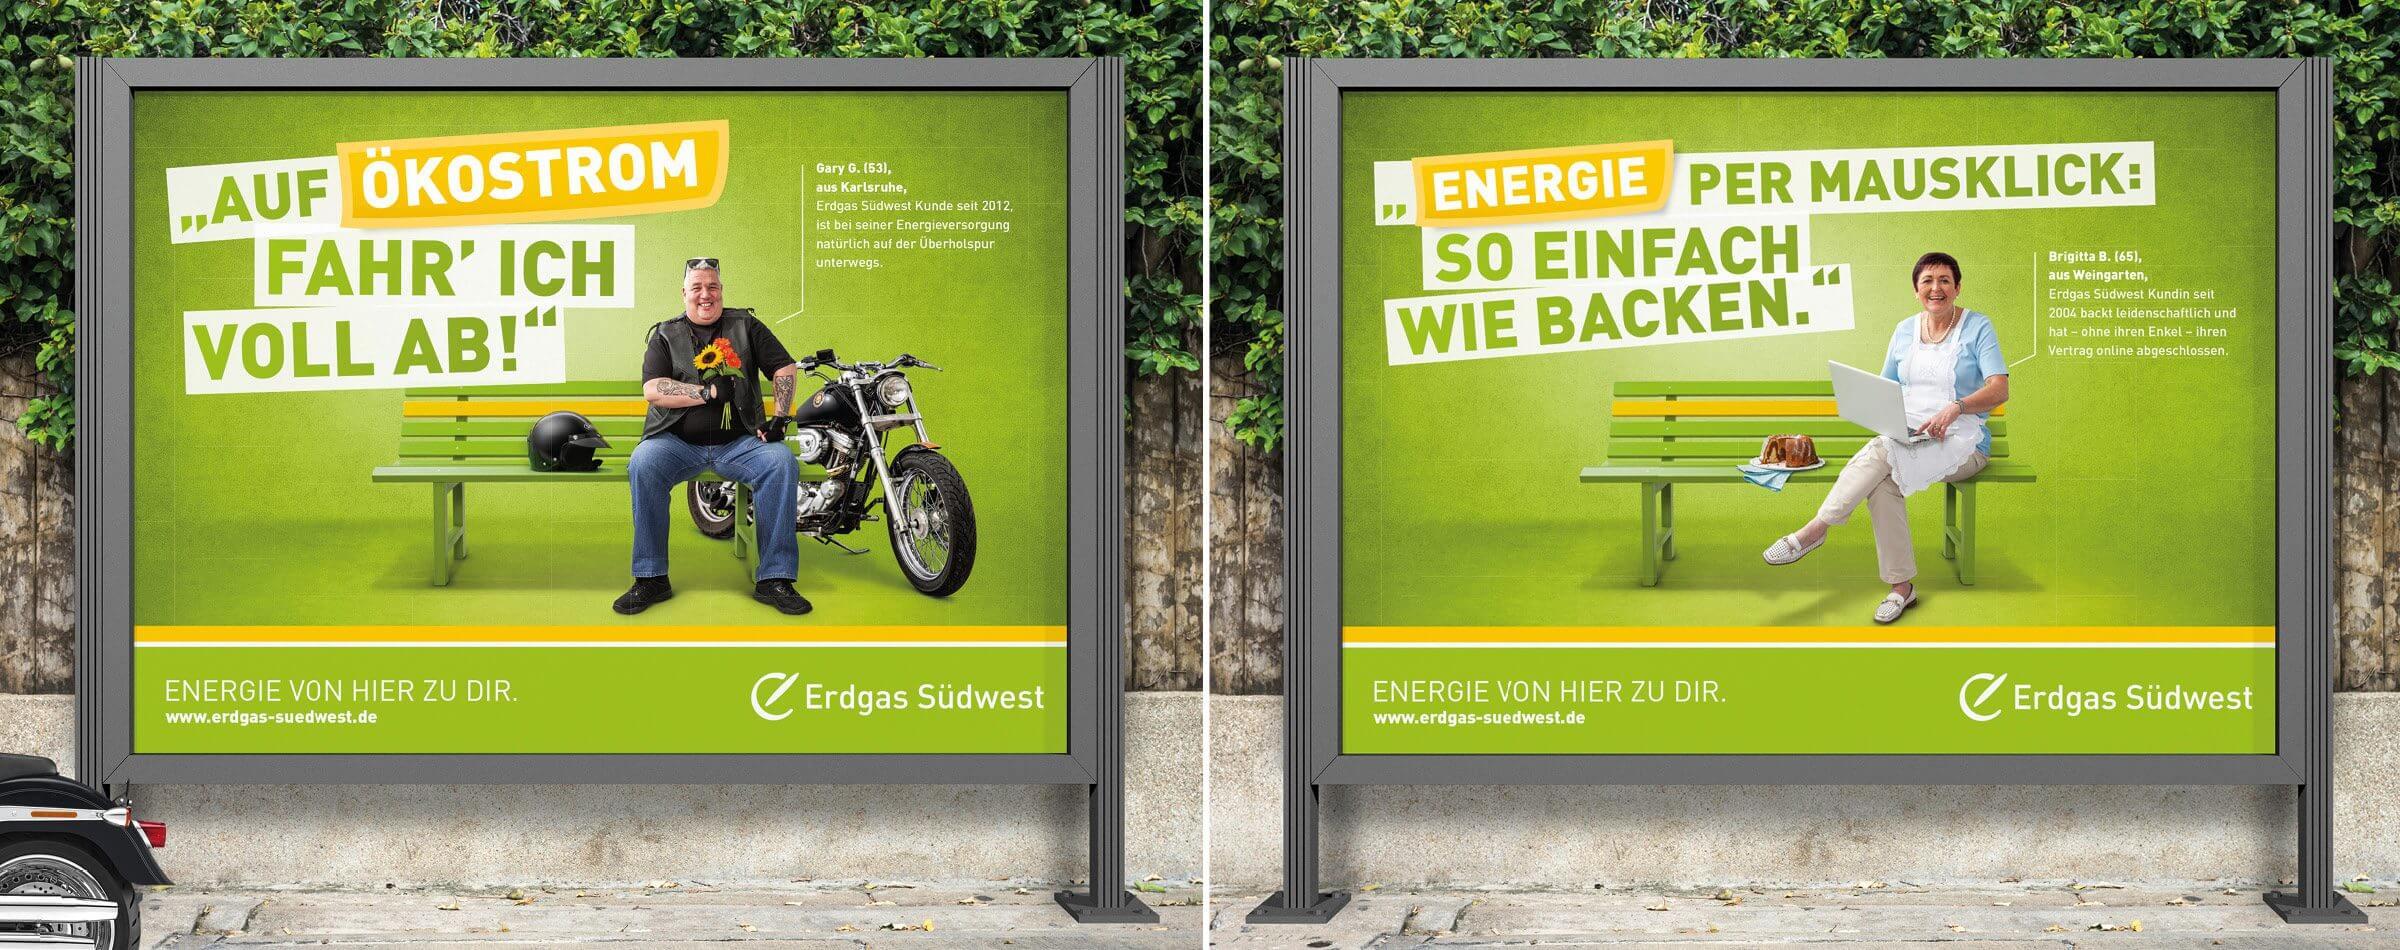 EBEP_181101_Relaunch_Web_ERD_Referenzkundenkampgne_01_4